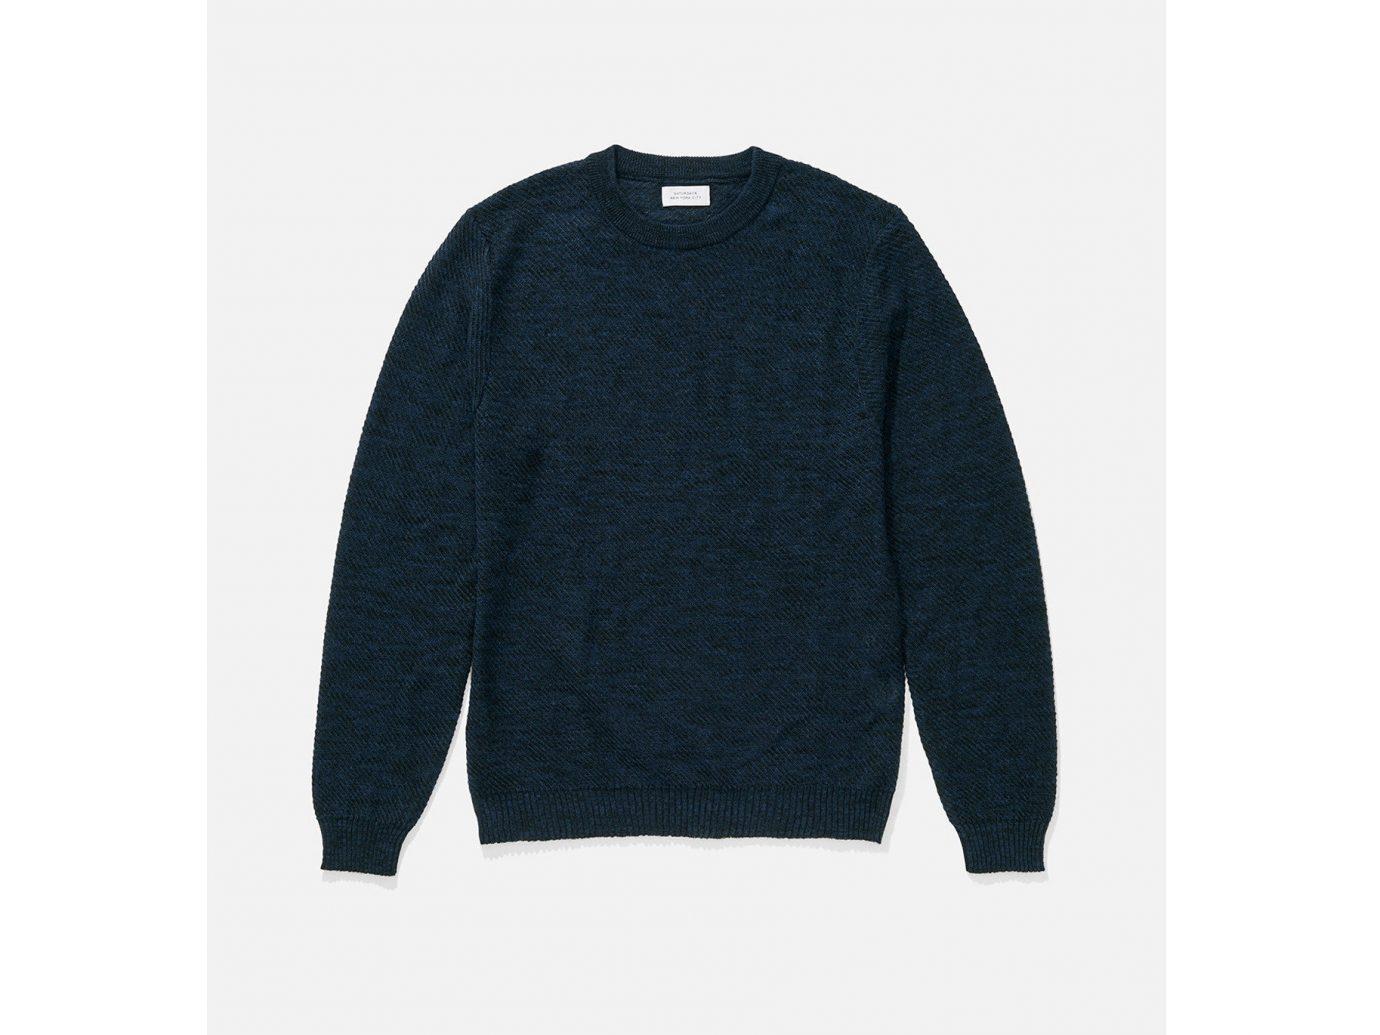 Style + Design Travel Shop sweater sleeve long sleeved t shirt product shoulder neck woolen